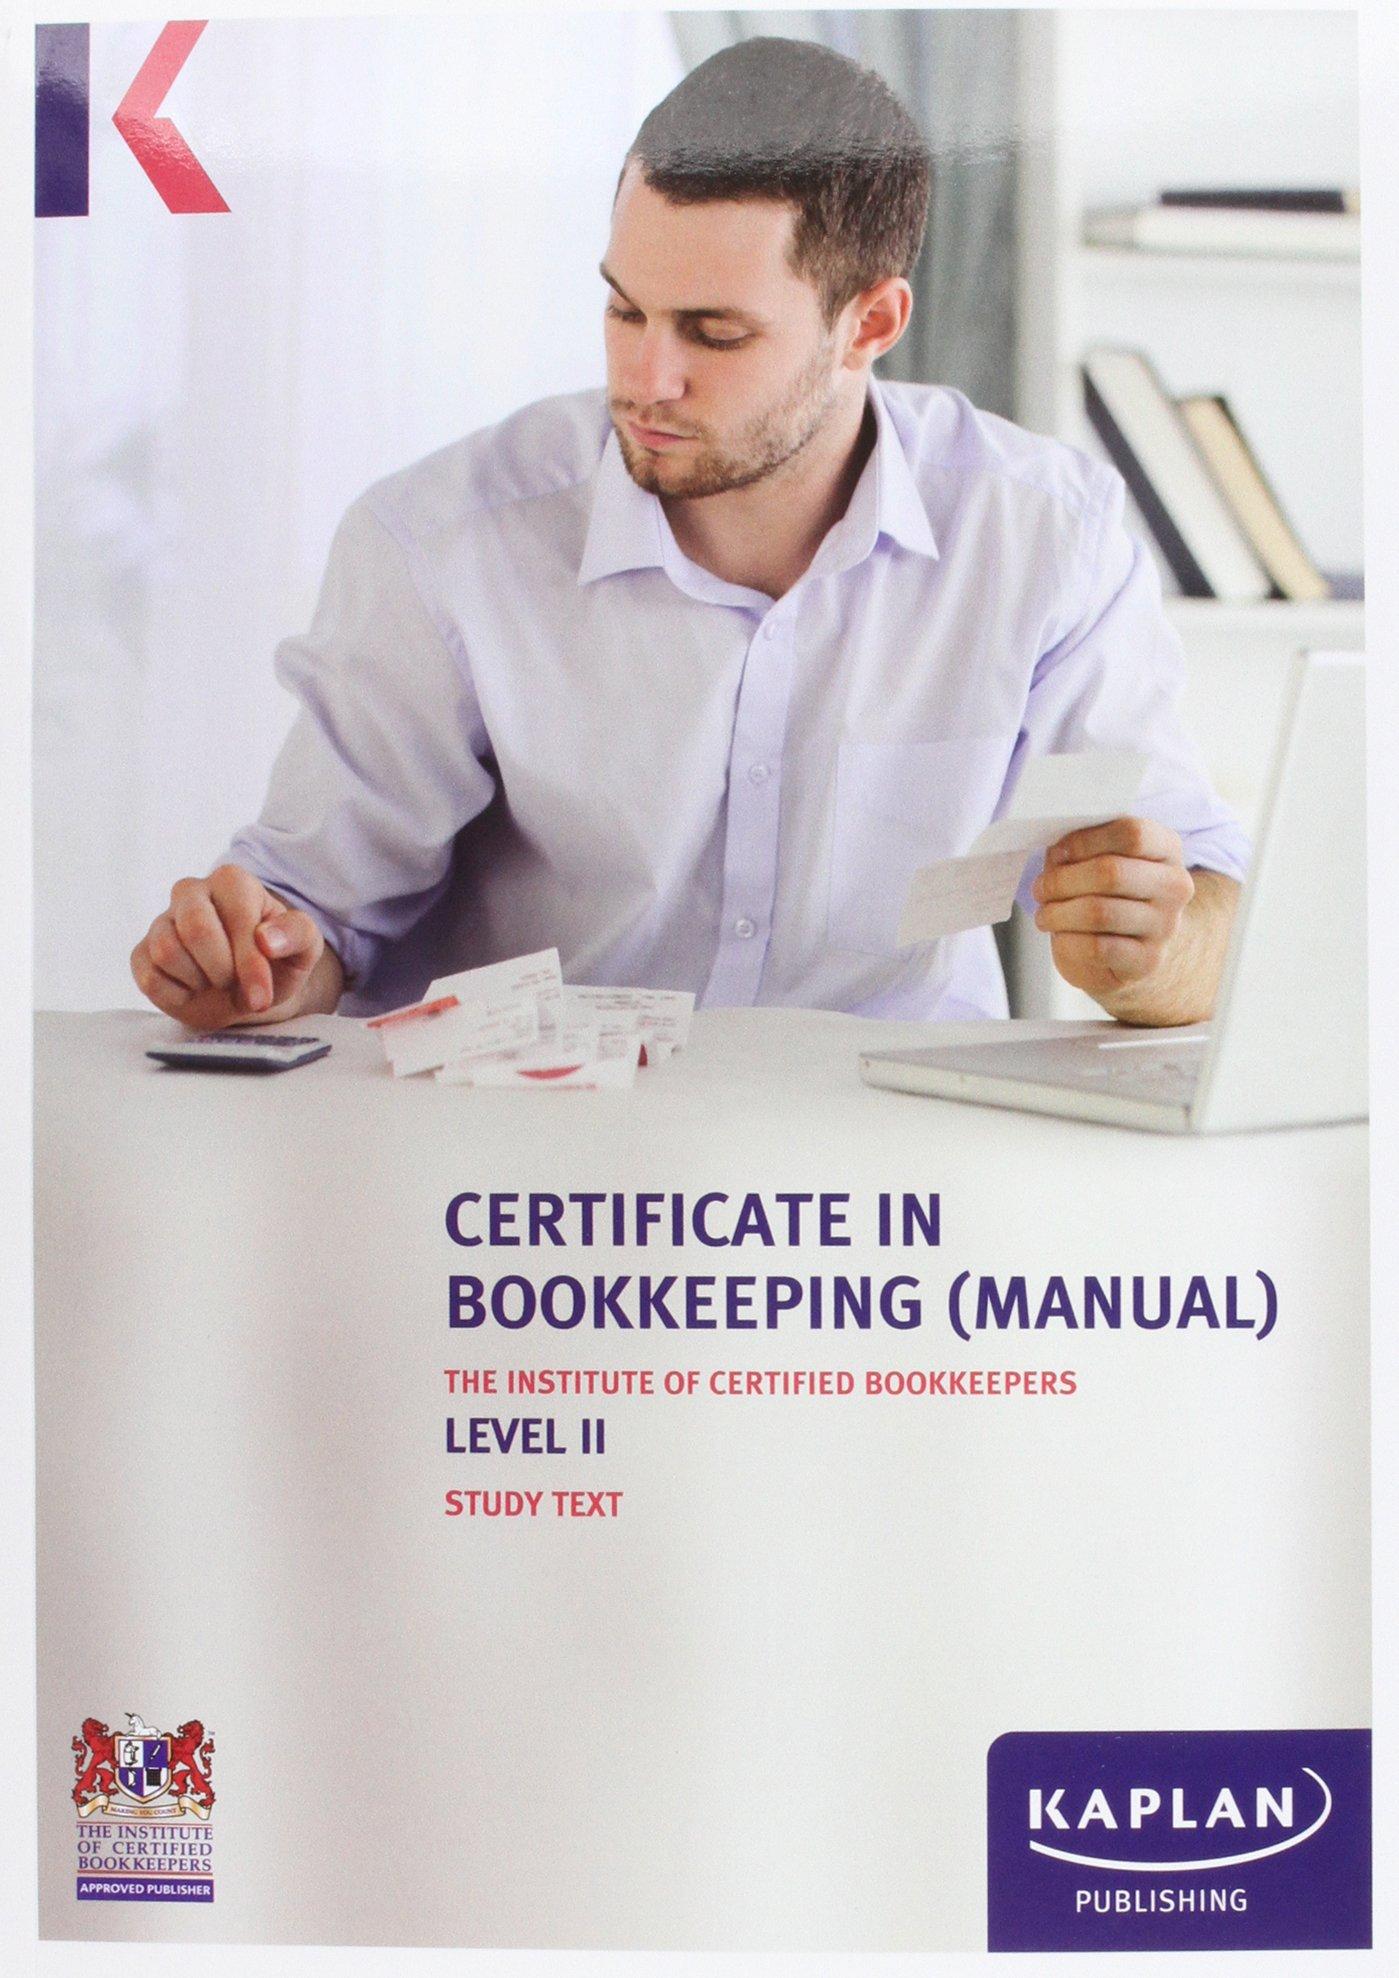 ICB Level II Certificate in Bookkeeping (Manual) - Study Text: Level II:  Amazon.co.uk: 9781784151881: Books